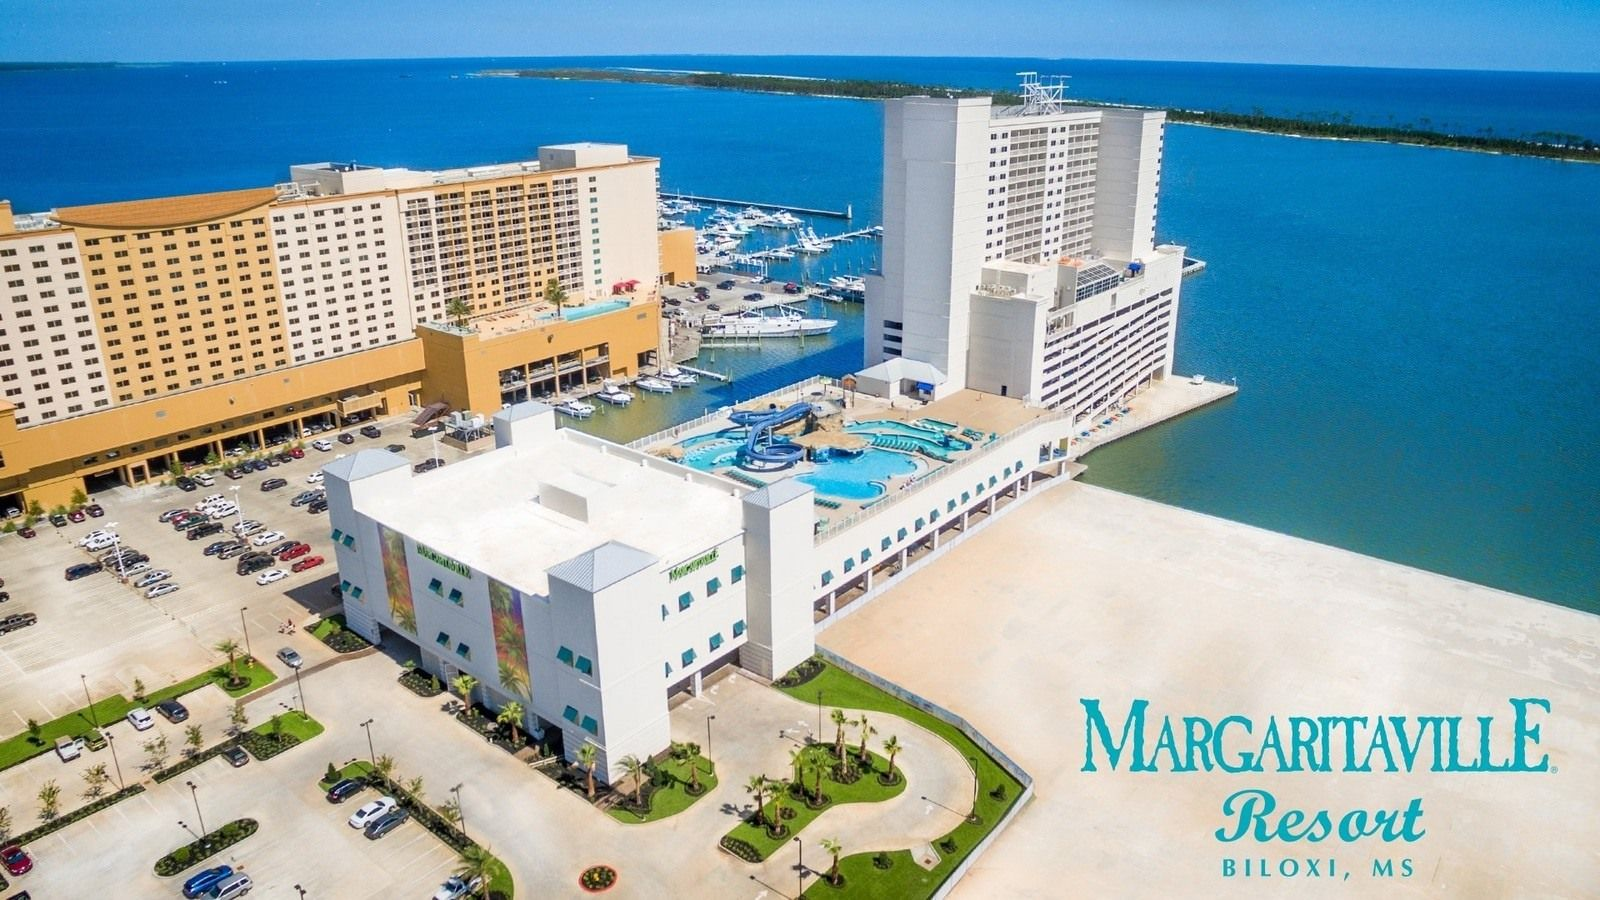 Ultimate List of Best Luxury Hotels in Biloxi, Mississippi, Margaritaville Resort Biloxi